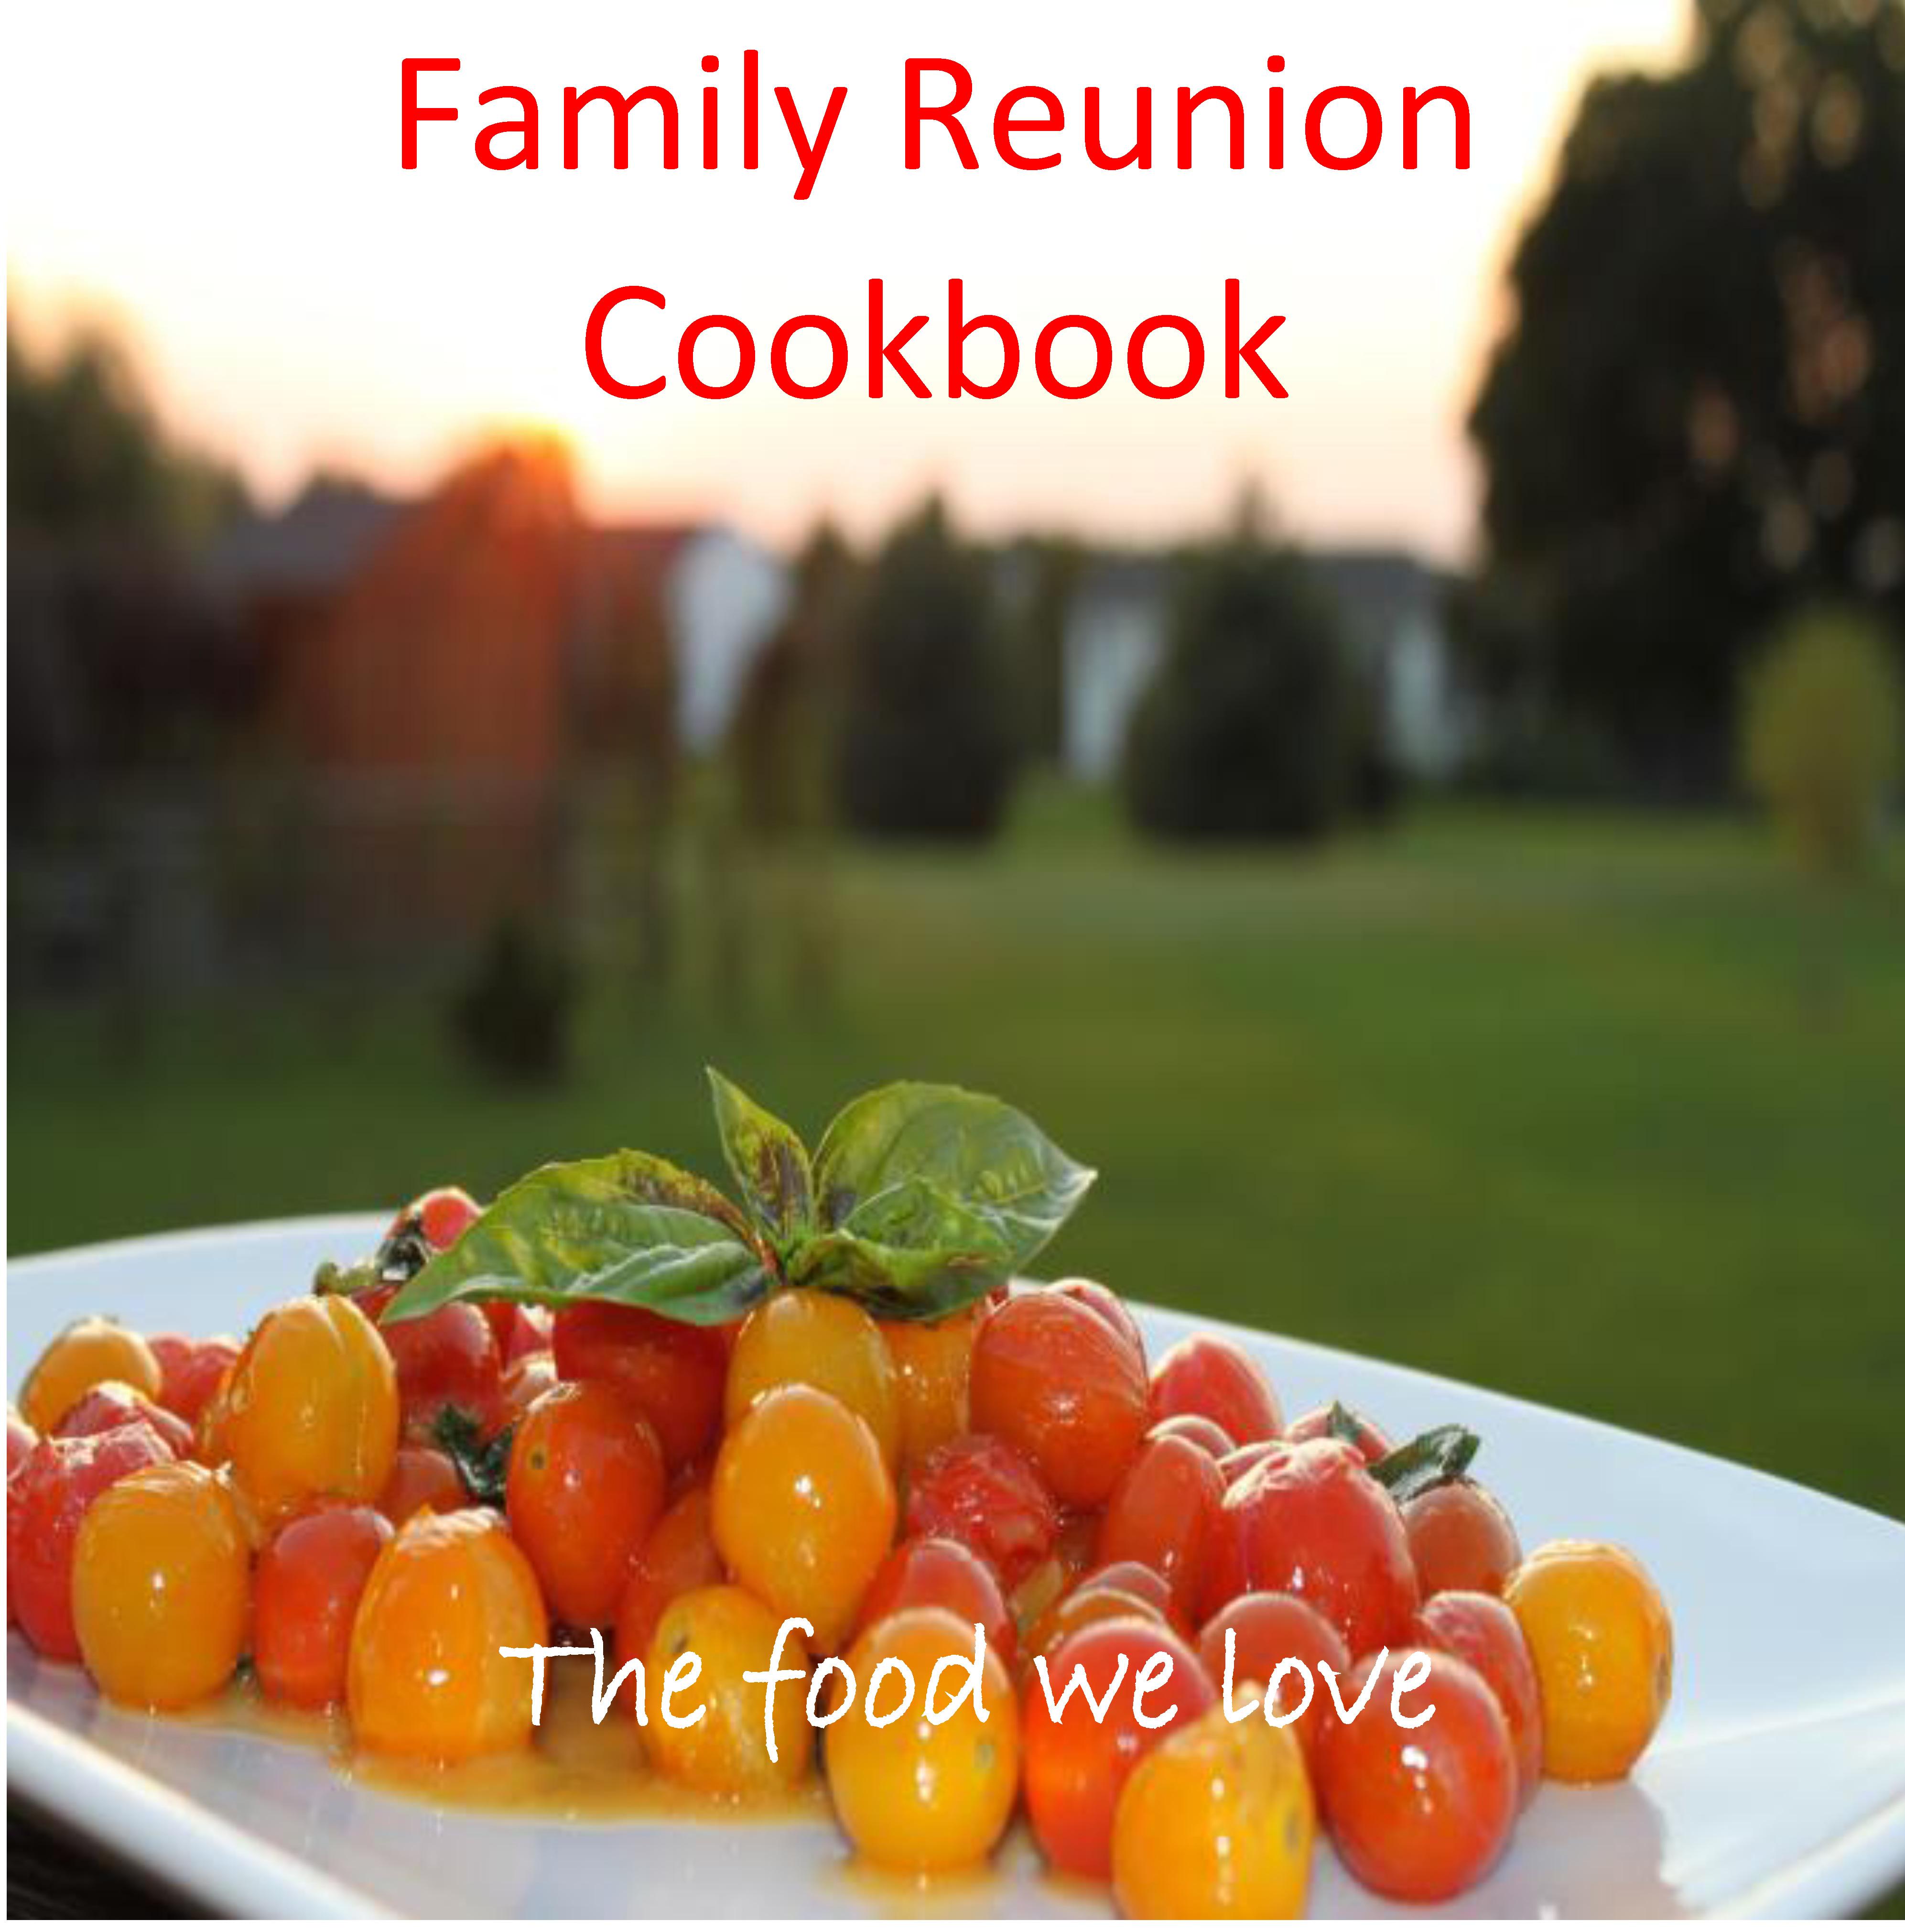 Family Cookbook – Family Reunion